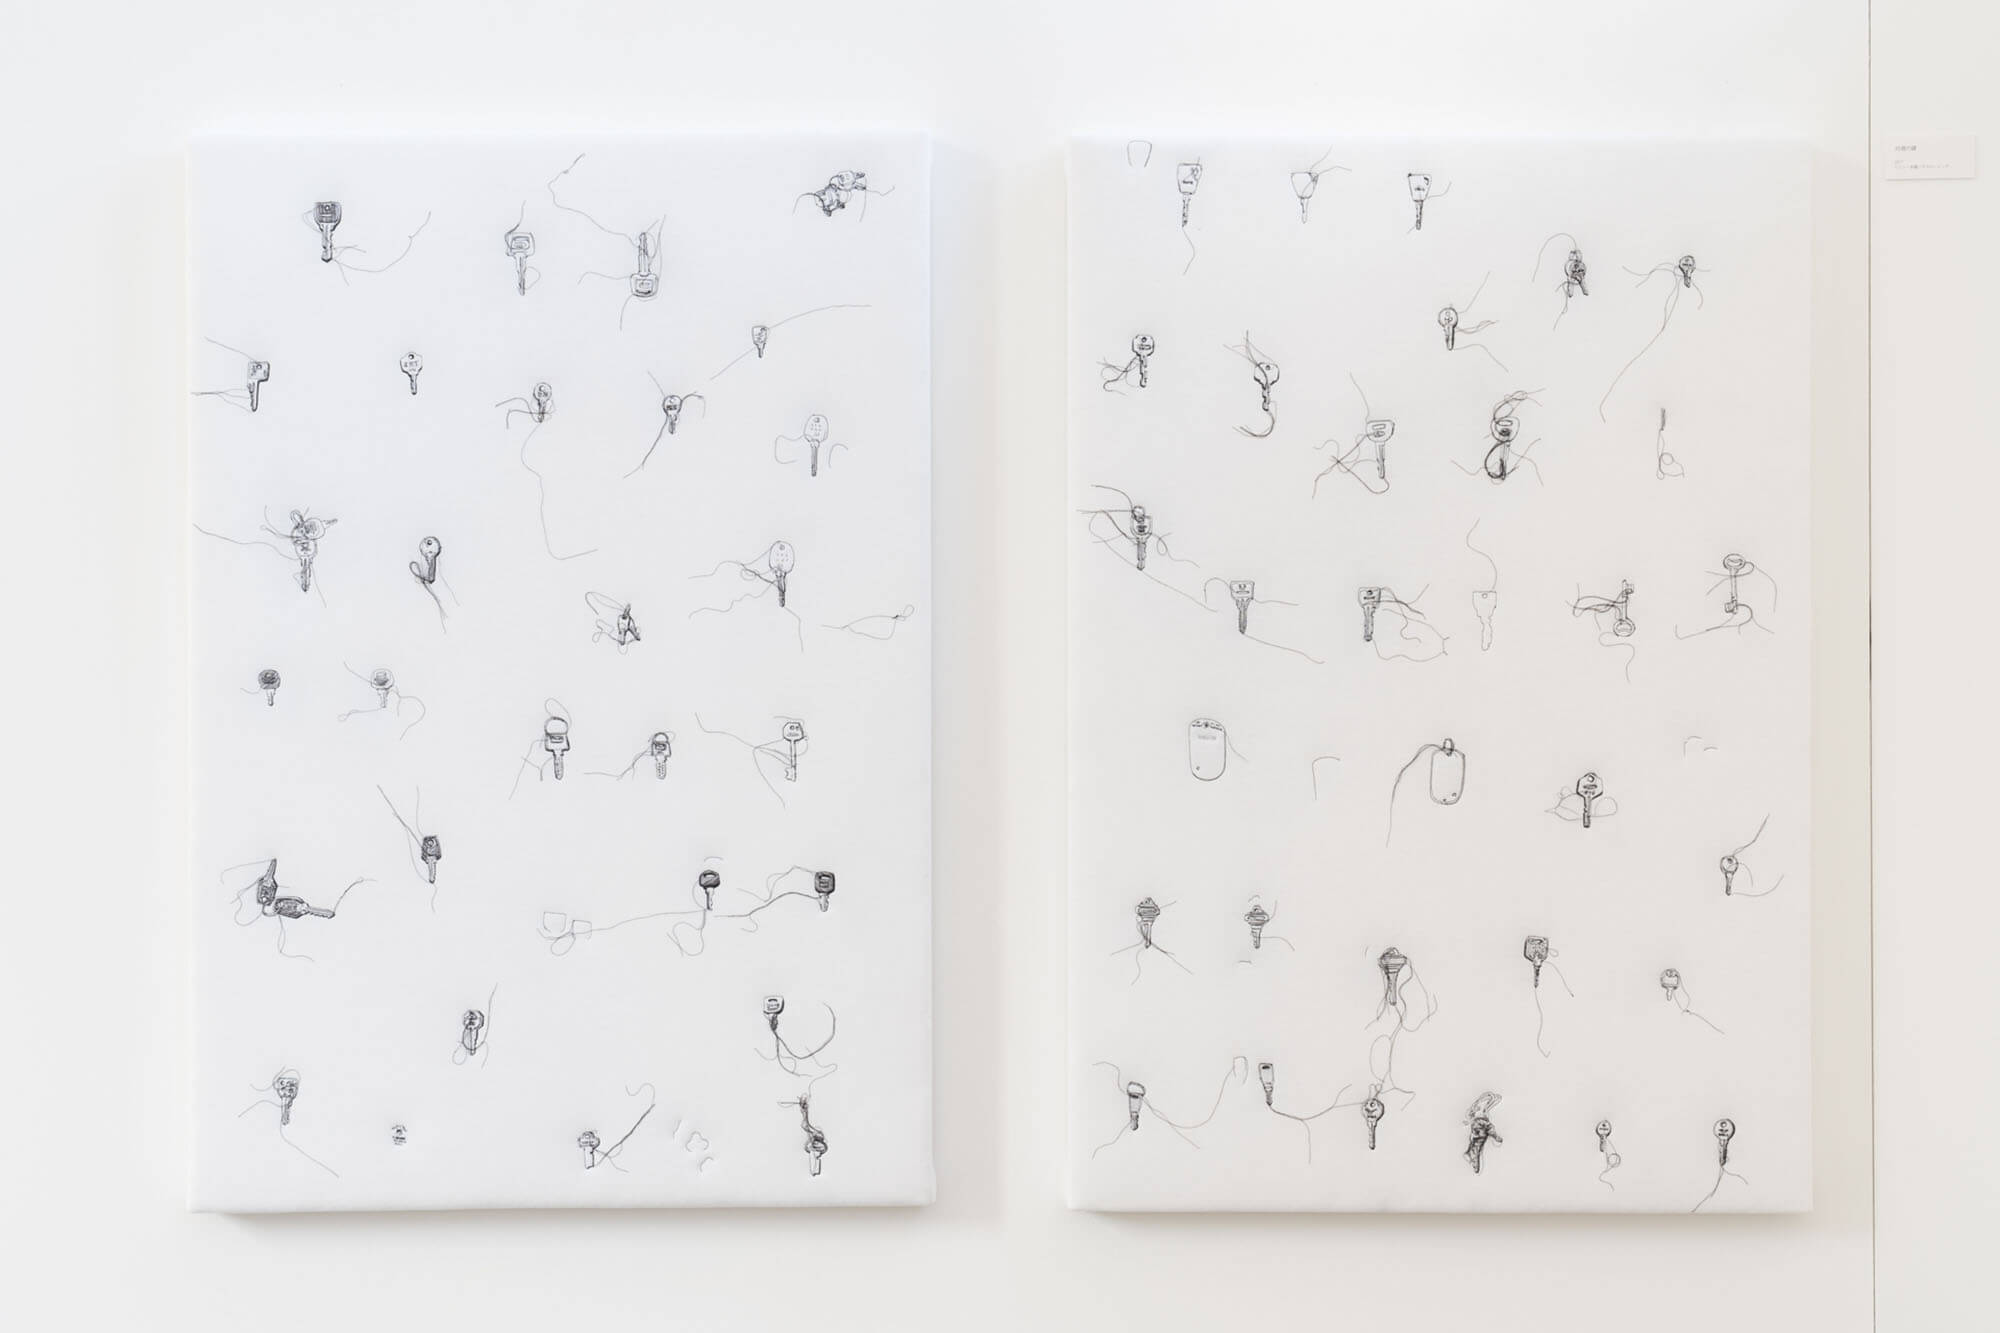 YCC Gallery ユ・ソラ offsociety inc. YCC Gallery Yu Sora 現代美術・アート Contemporary Art